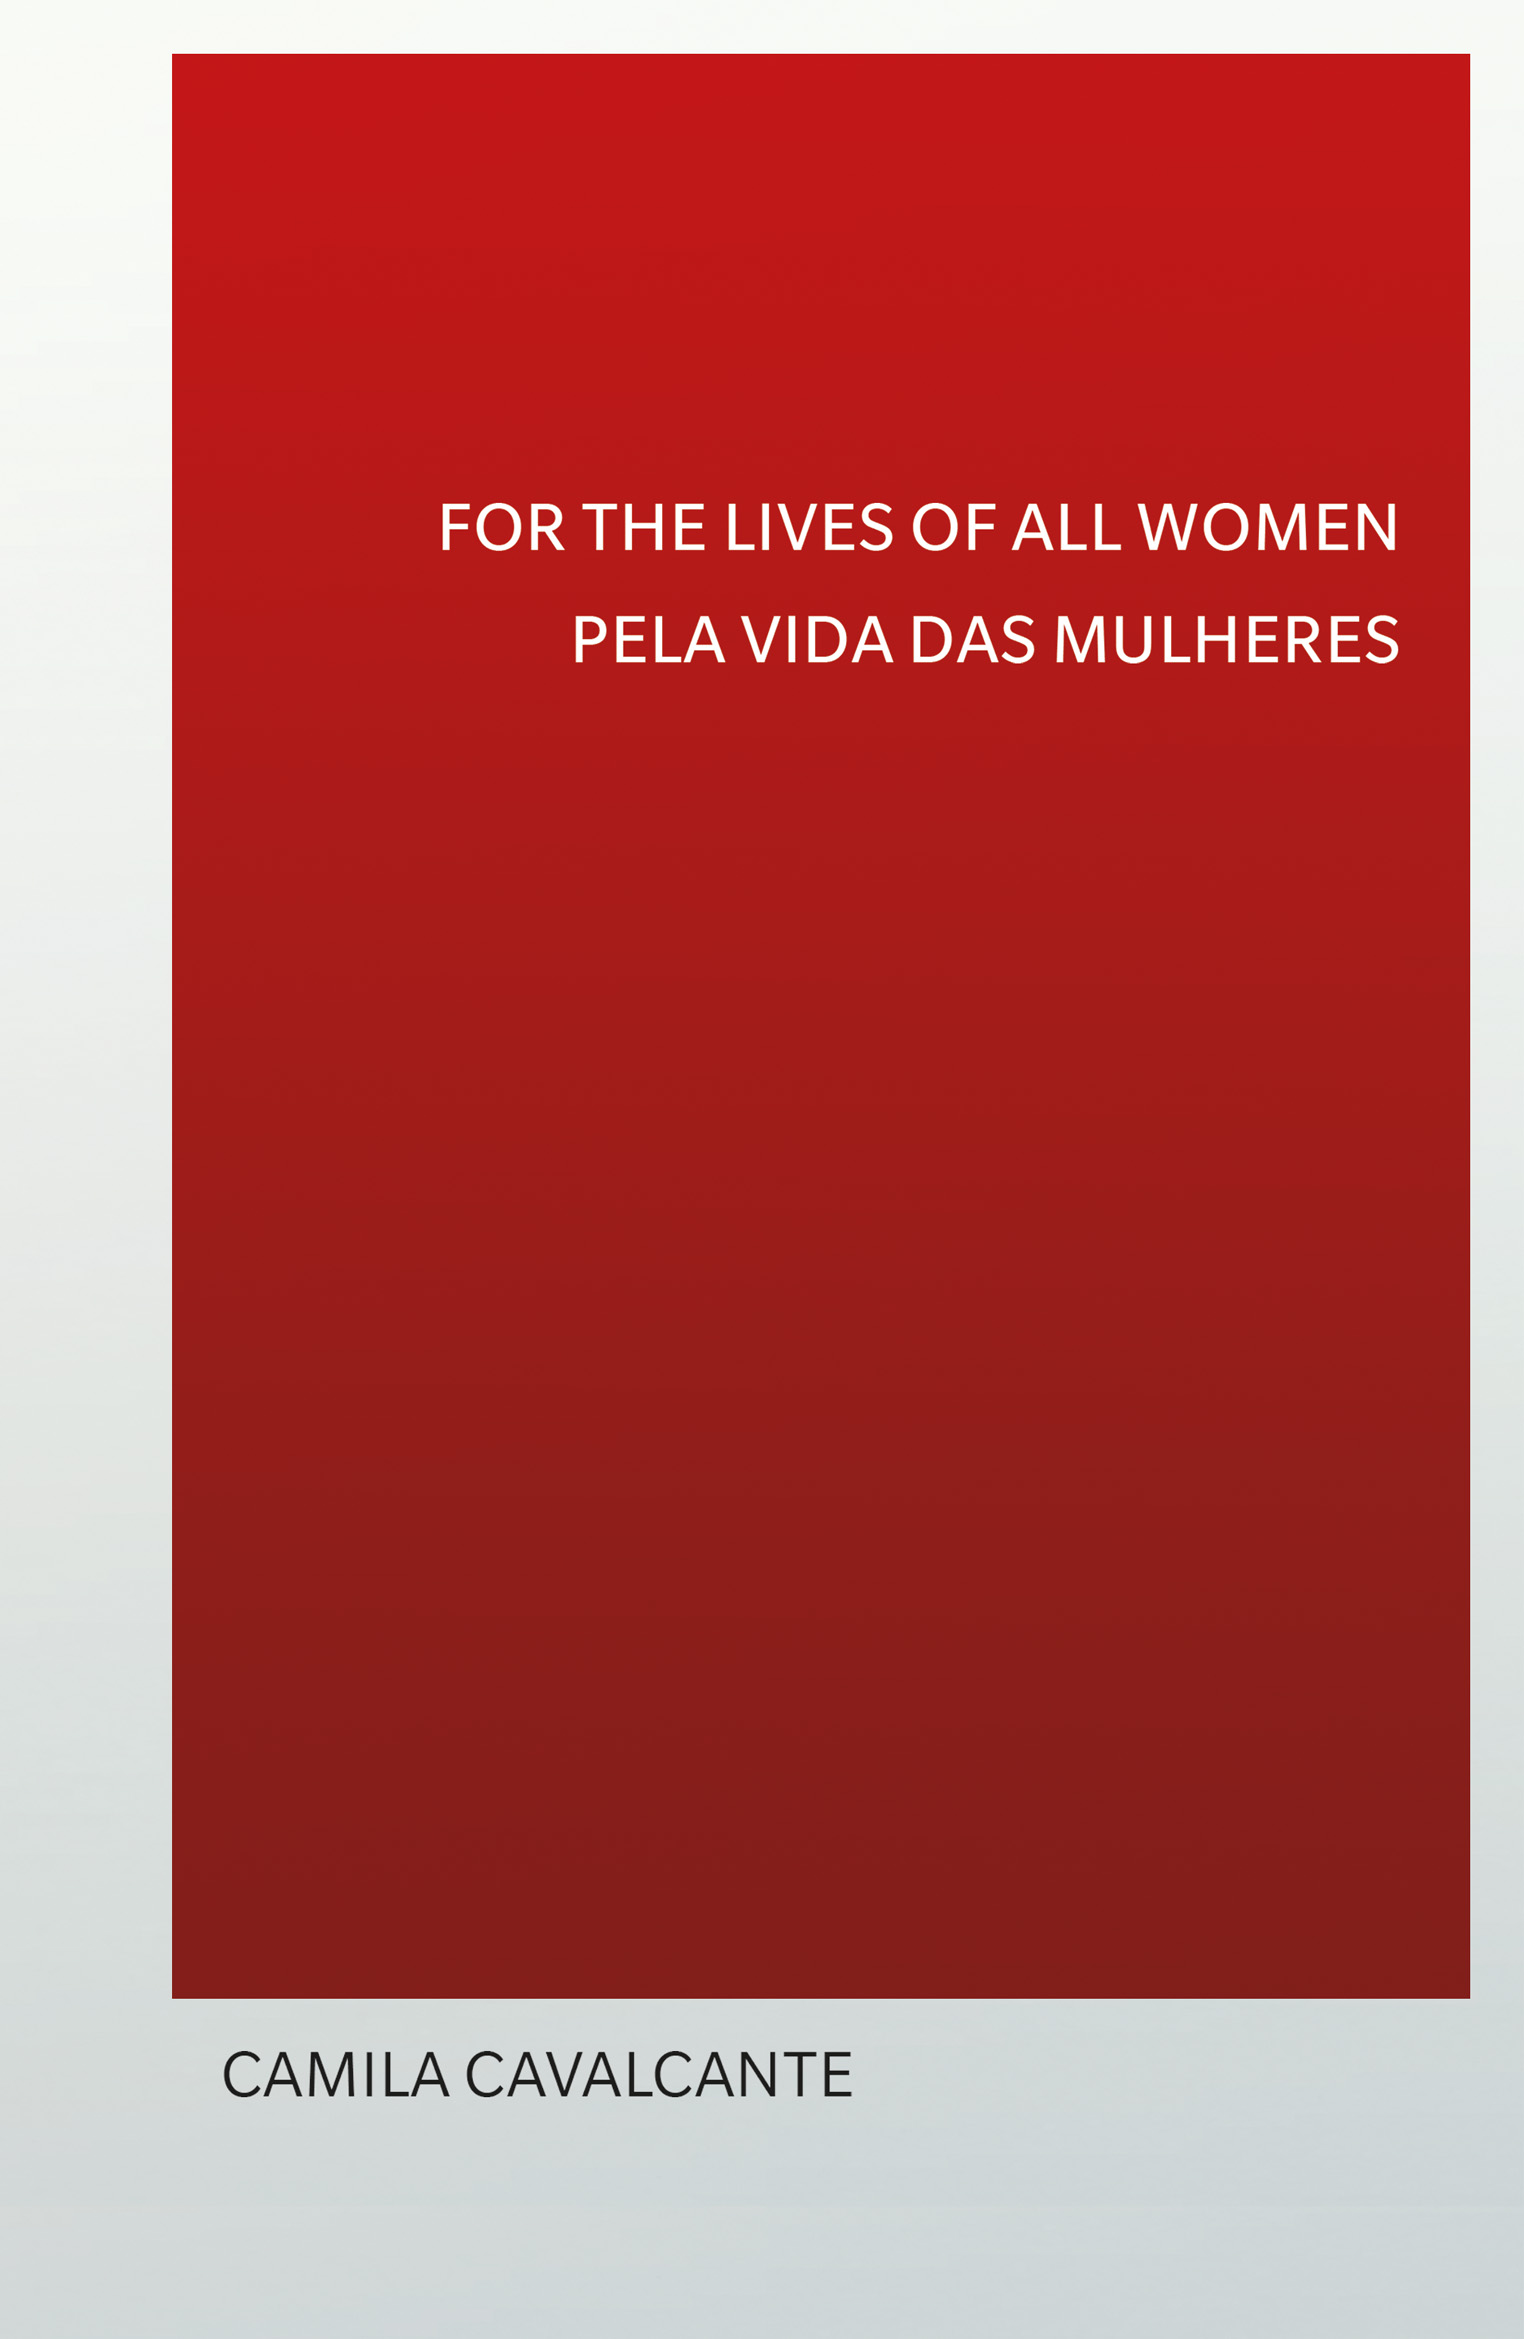 For the Lives of All Women/Pela Vida dad Mulheres